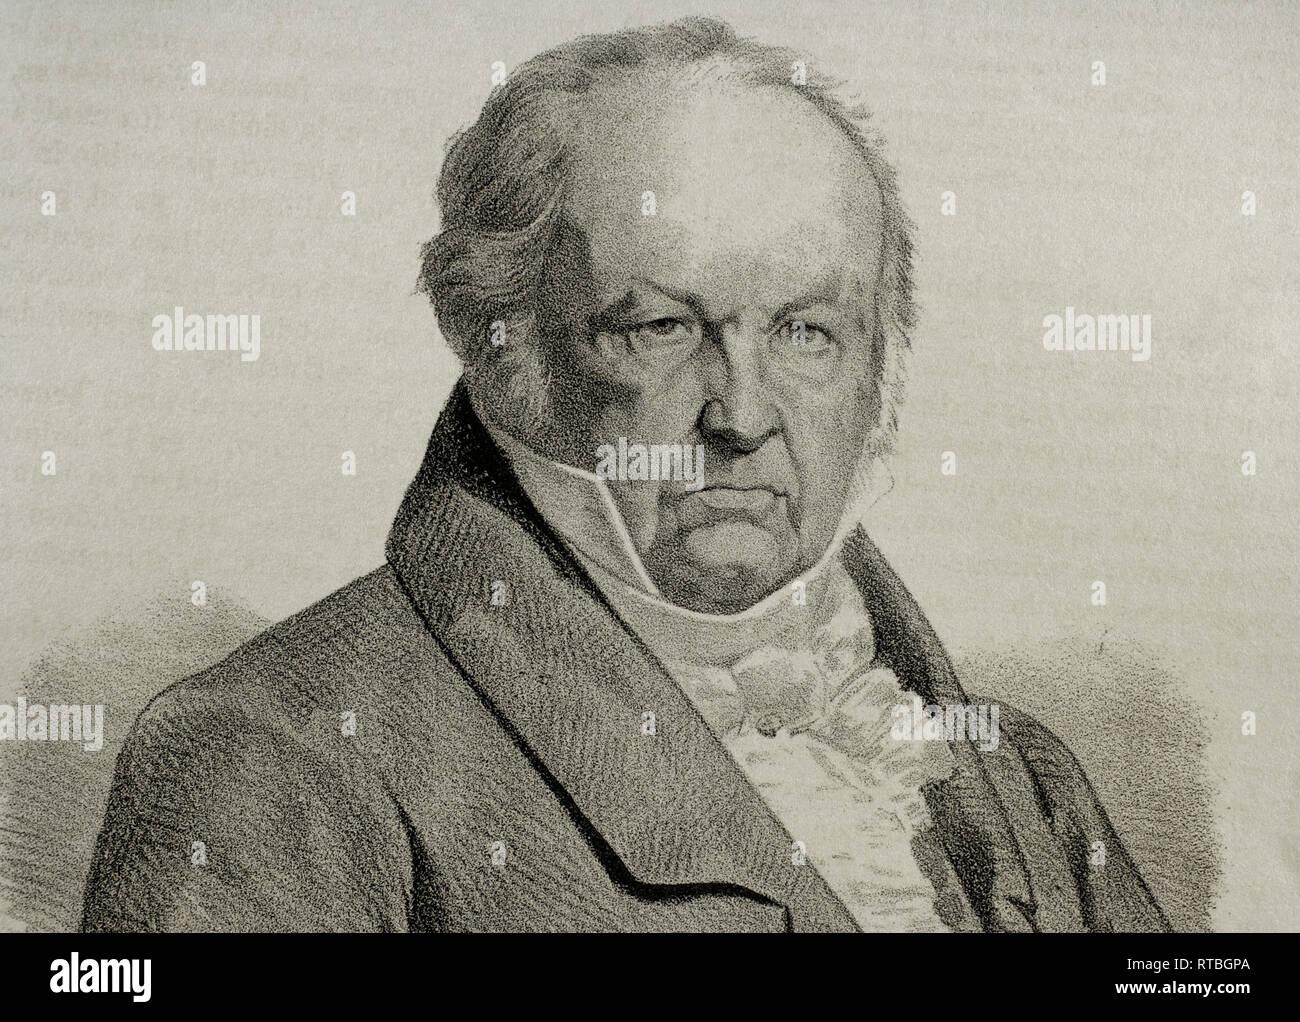 Francisco de Goya (1746-1828). Spanischer Maler. Lithographie, Detail. Crónica de España, Historia y Ilustrada Descriptiva de Sus Provincias. Katalonien. 1866. Stockbild